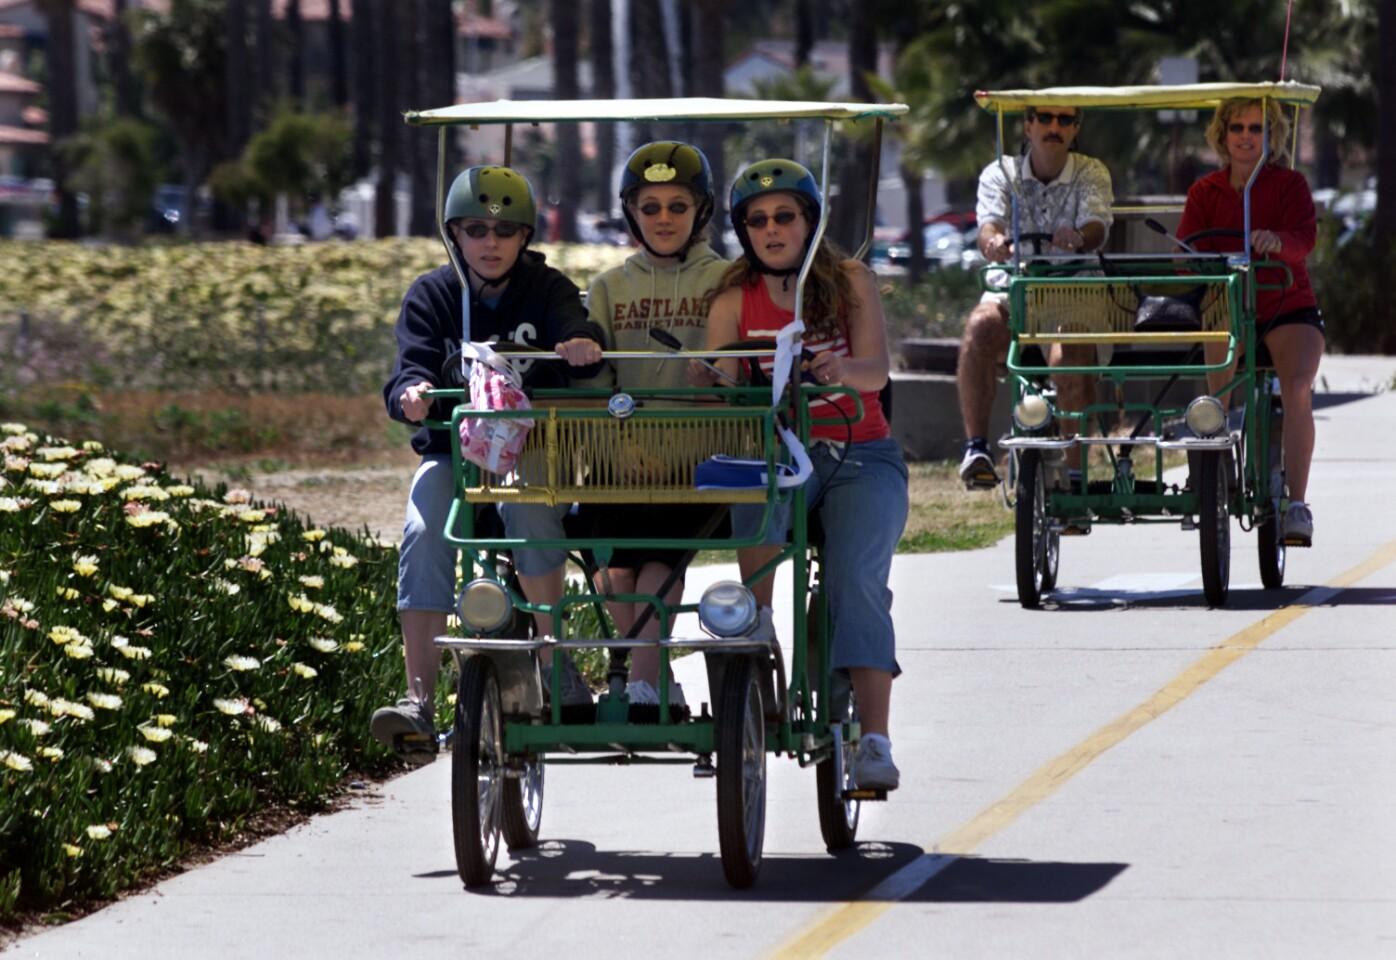 MA group in a surrey pedals along a bike path that runs along the beach.